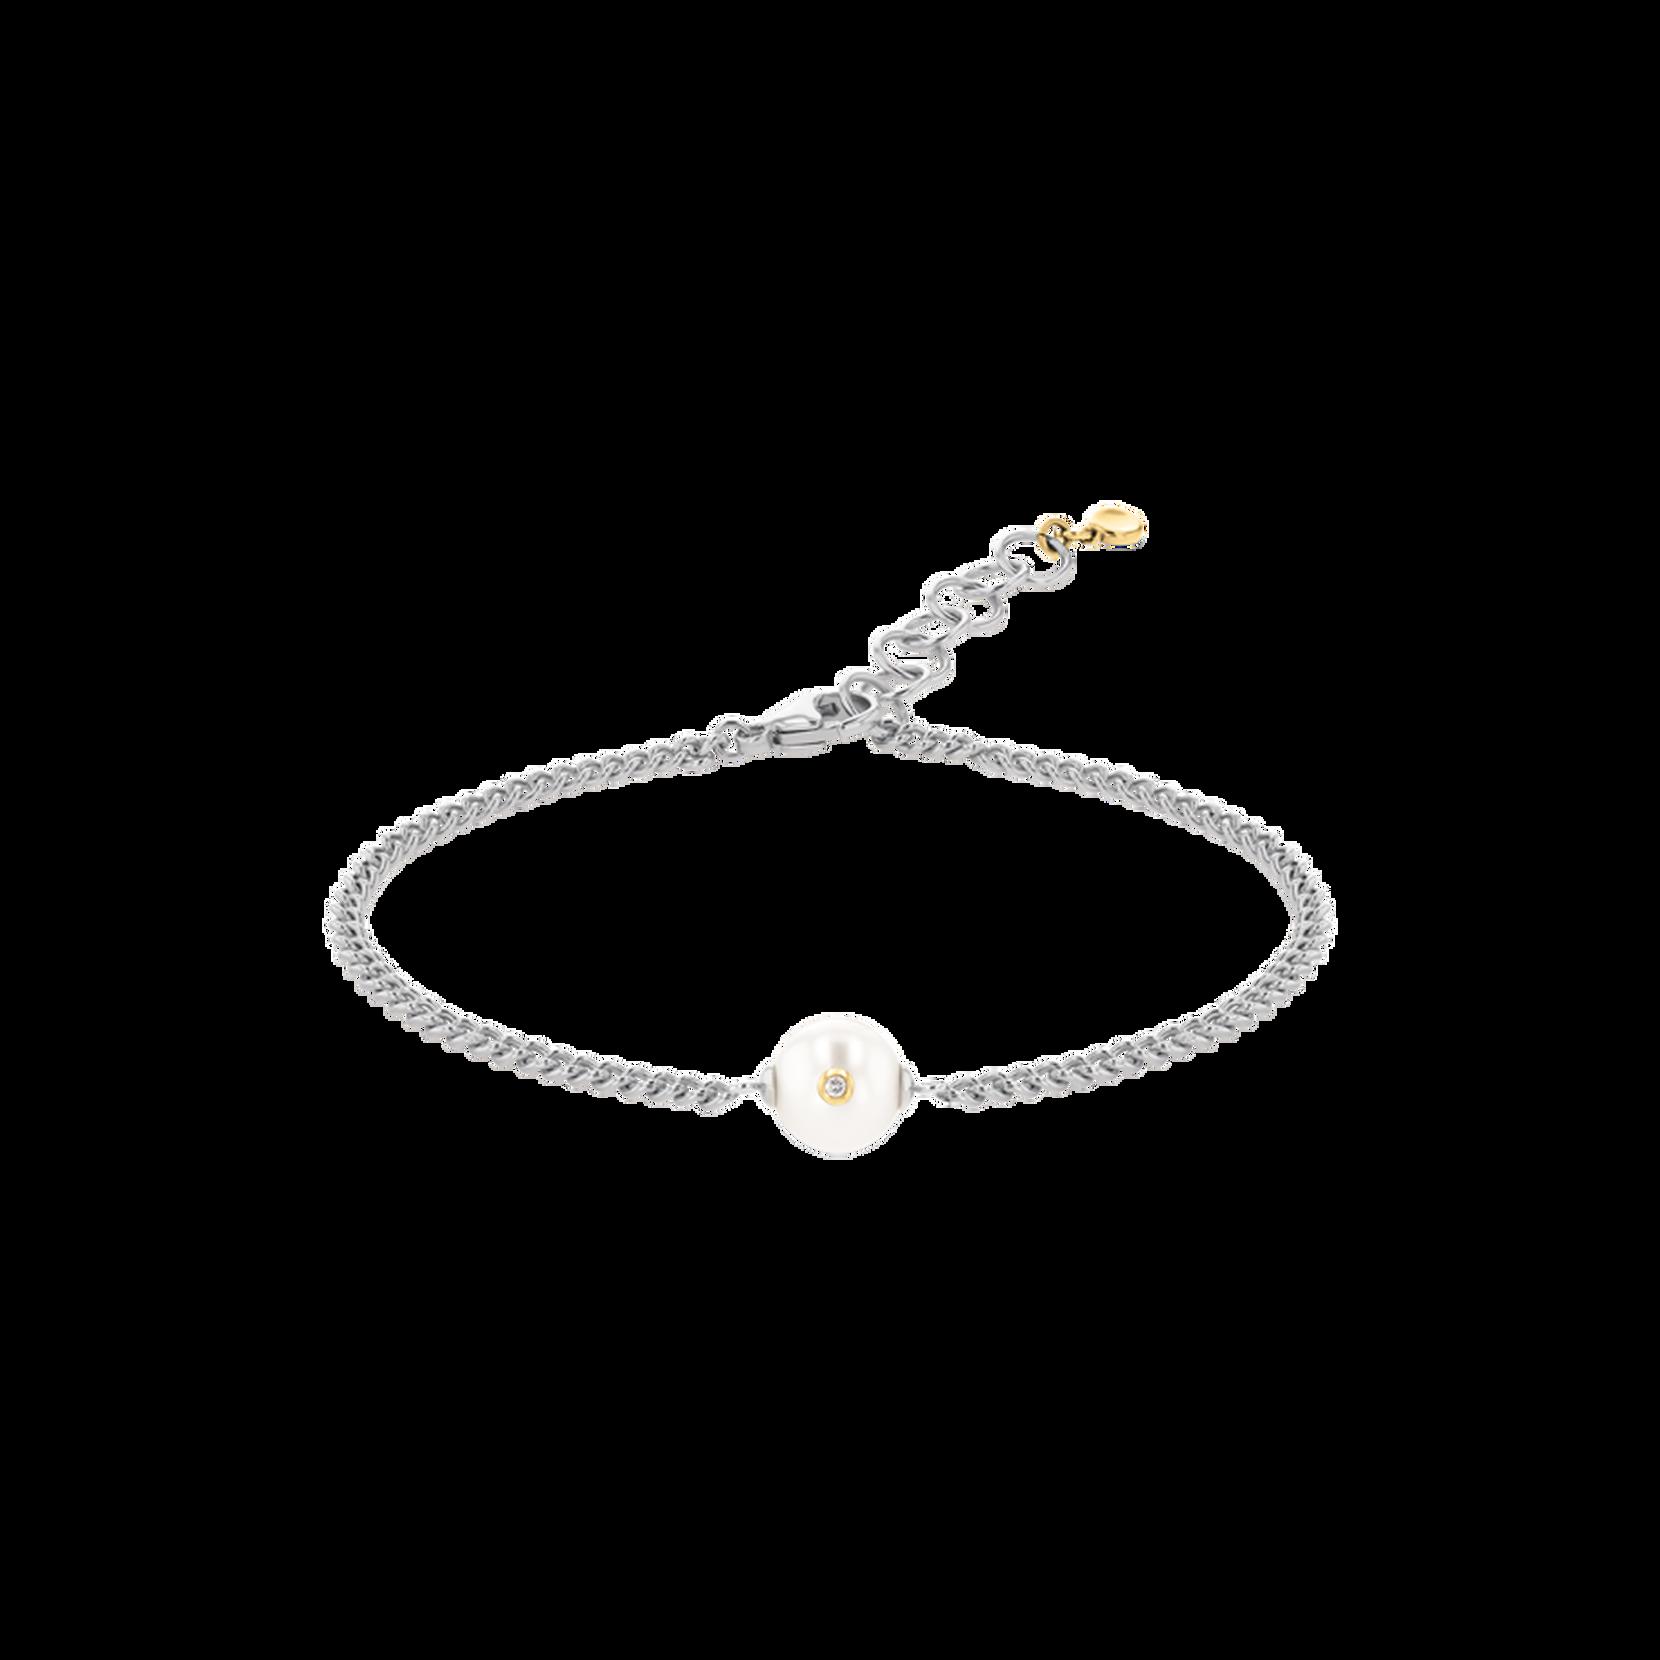 Movado Signature Pearl Chain Bracelet